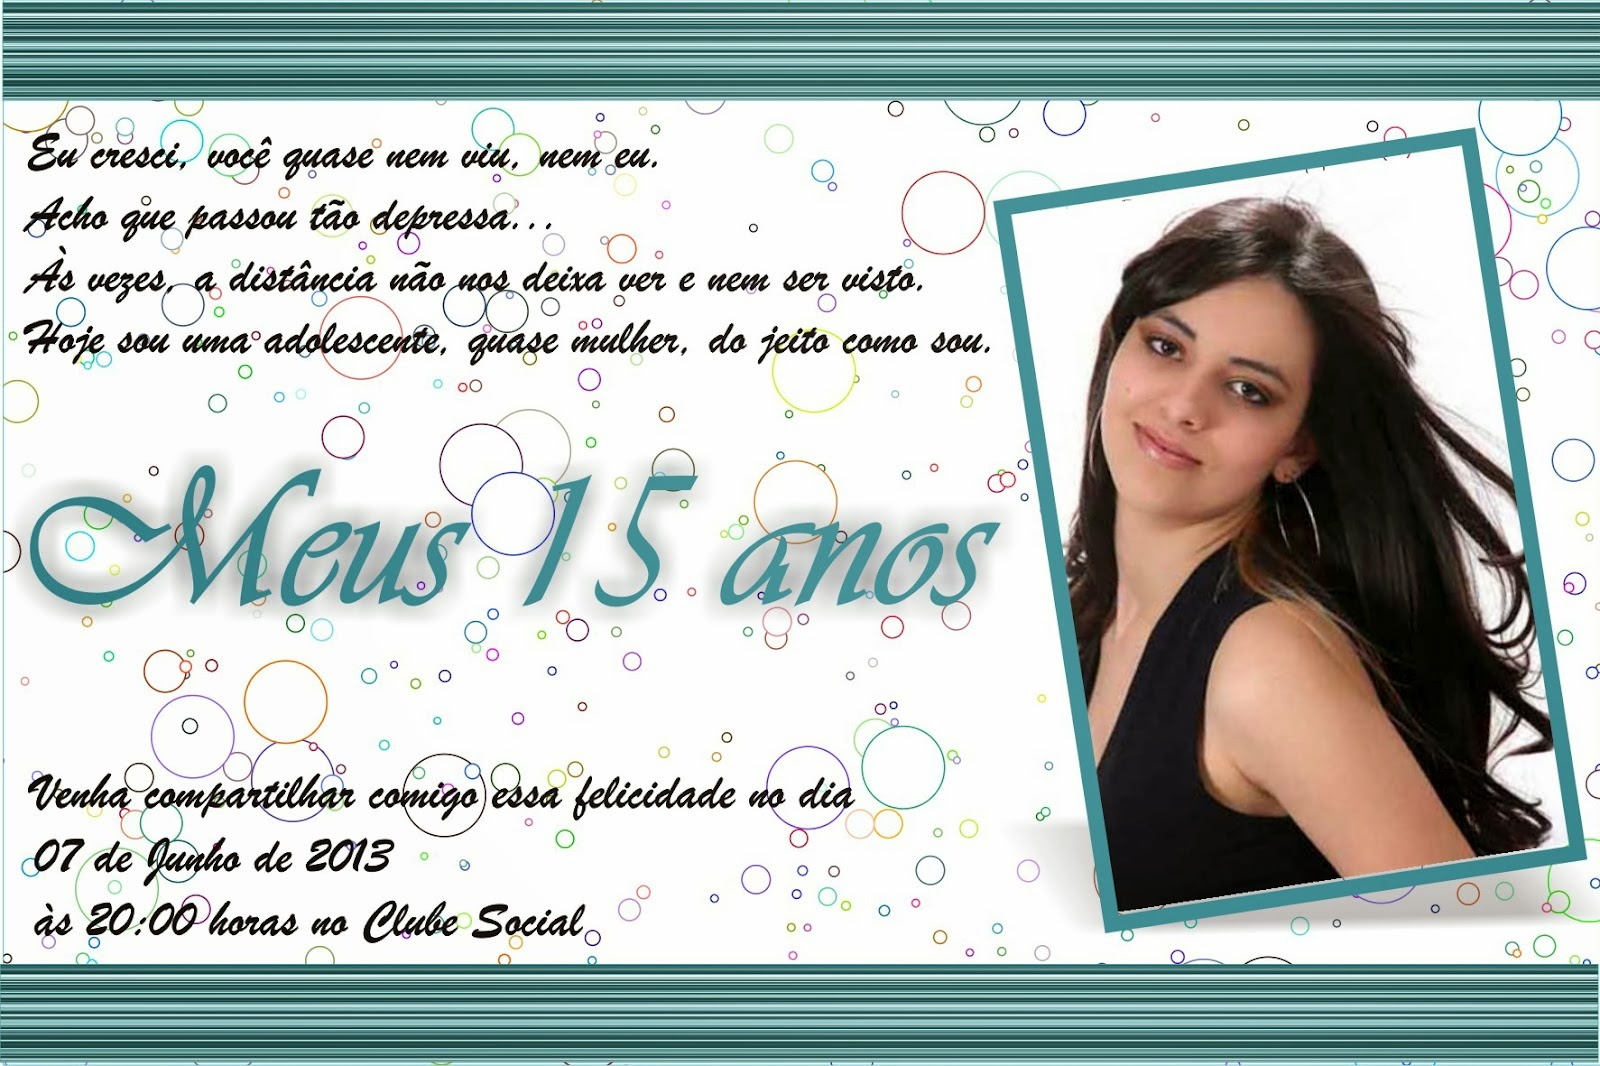 Tag Frases Para Convite De Aniversario De 18 Anos Evangelicas